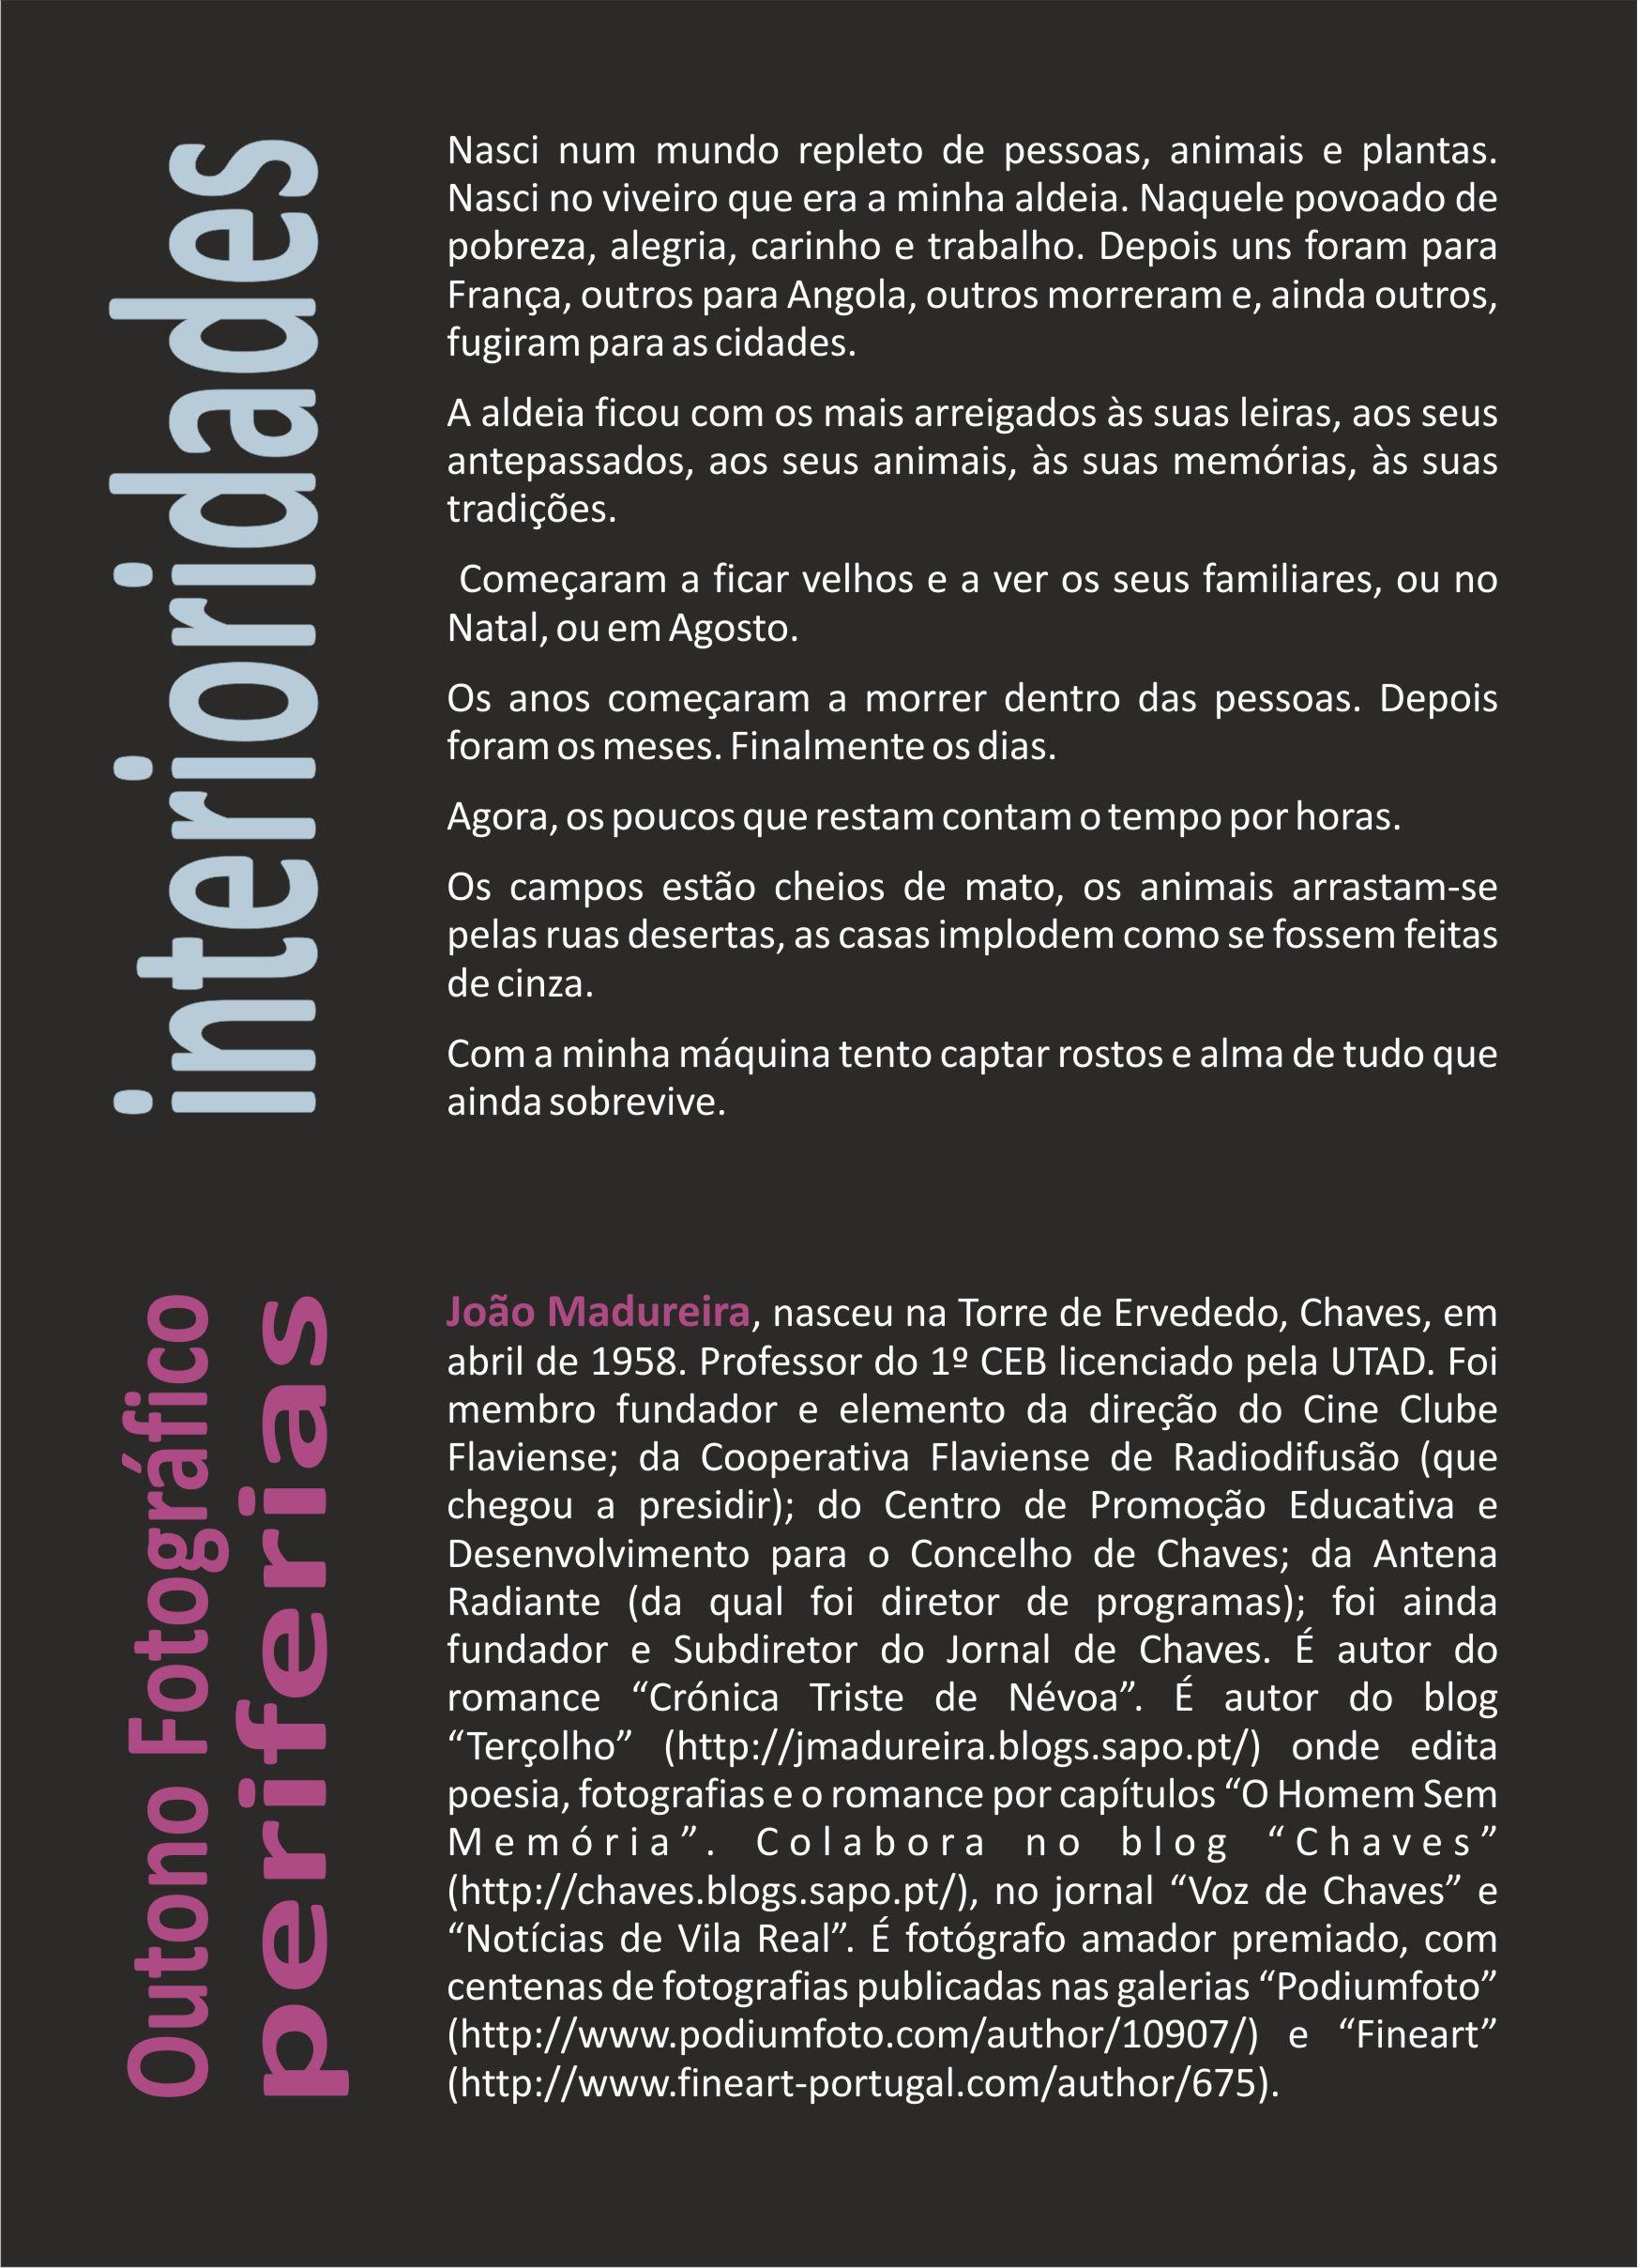 catalogo-jm.jpg